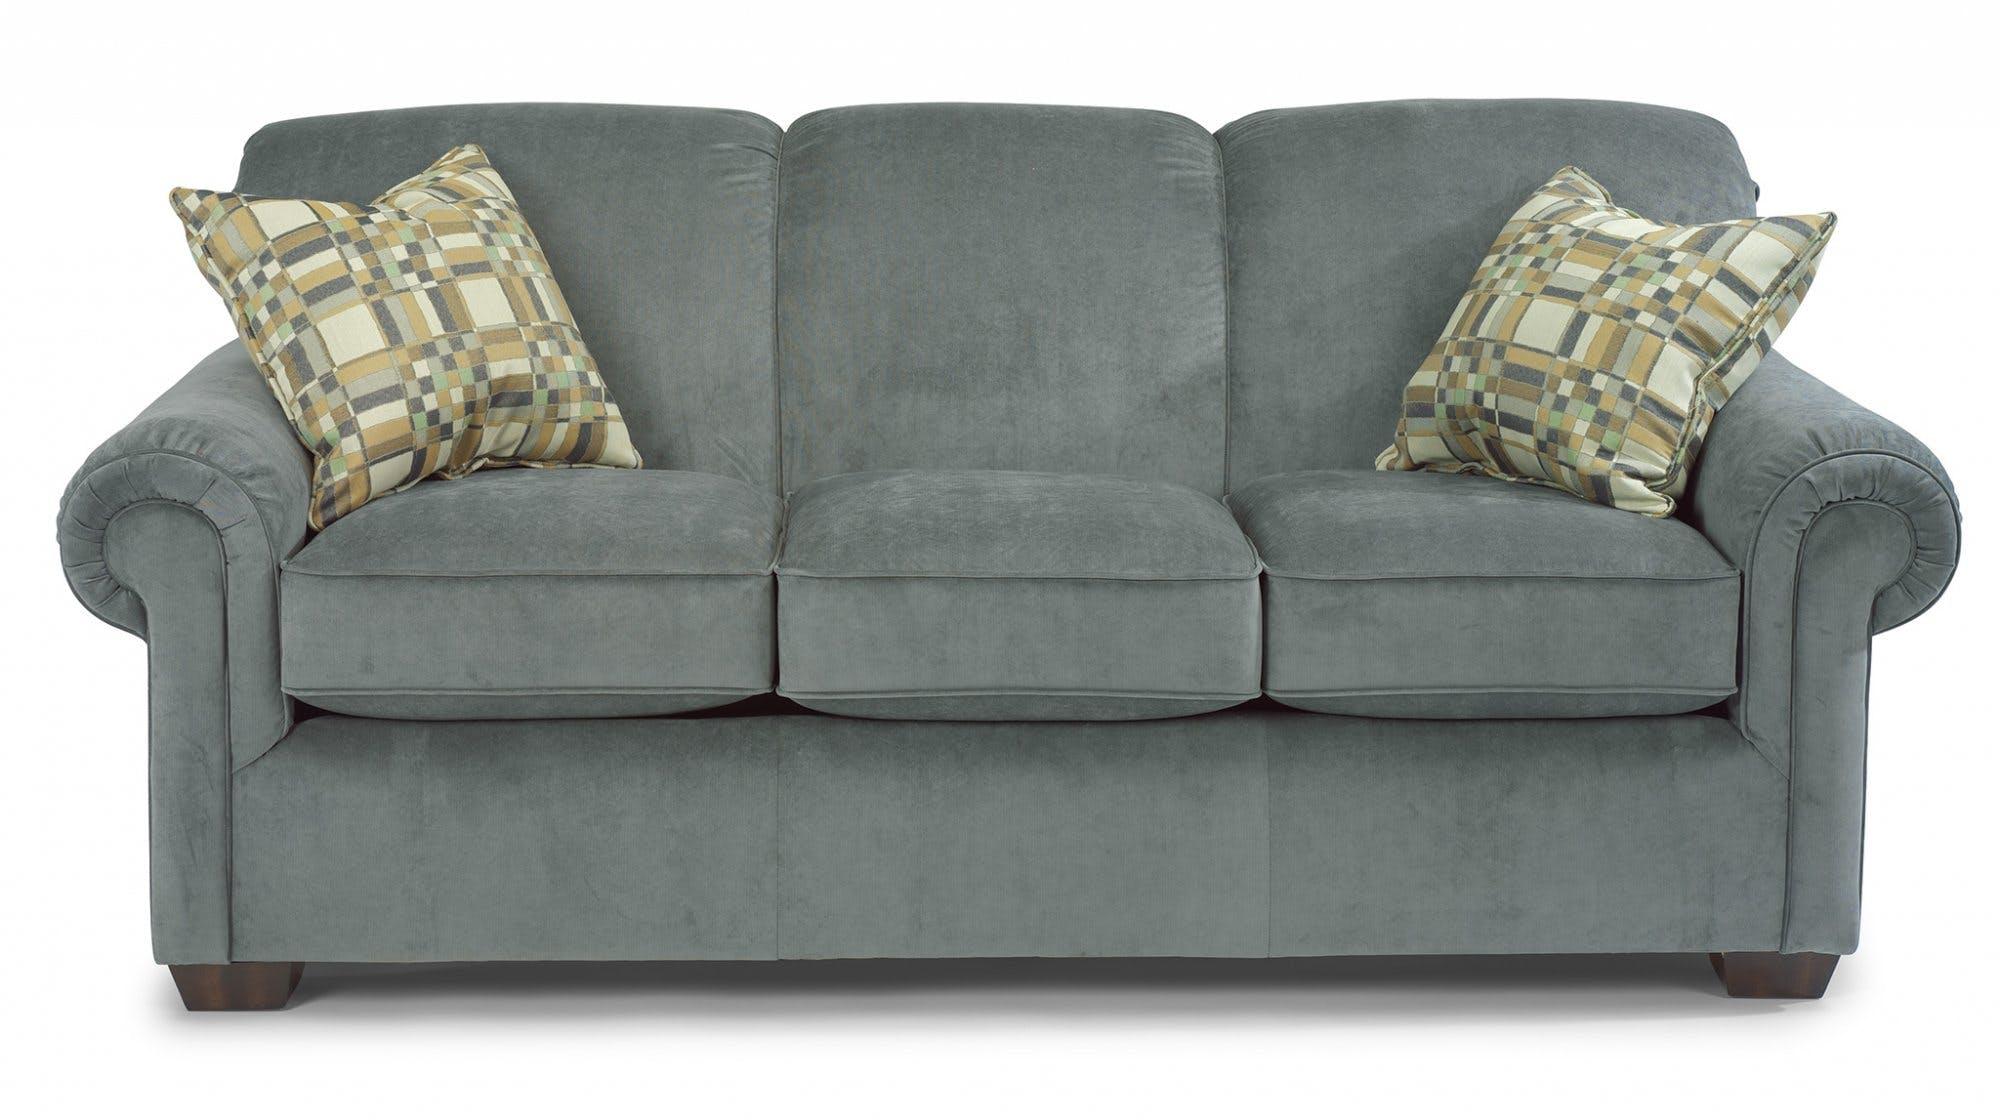 Flexsteel Living Room Fabric Sofa 5988-30 - Carol House Furniture